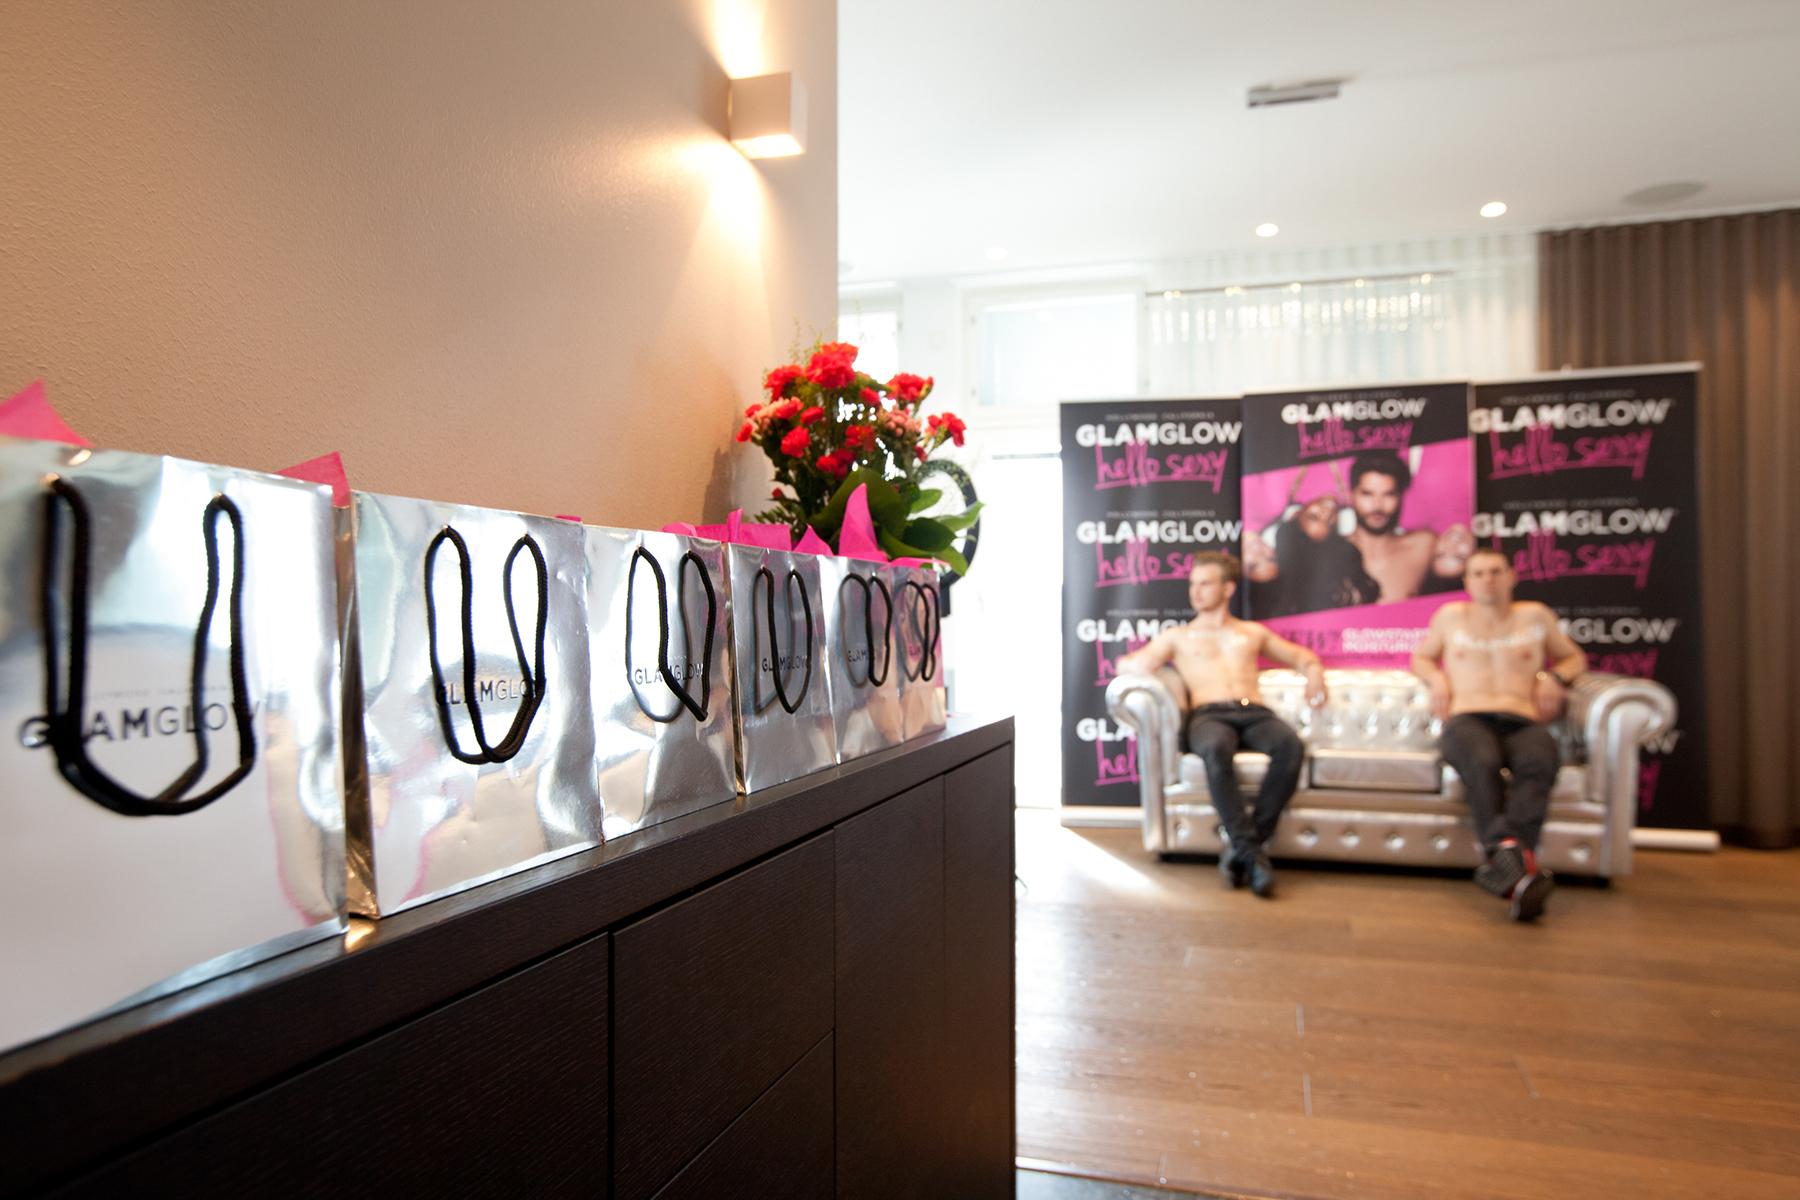 2 glamglow 11.5.2017 pr event helsinki bloggers vloggers successstory pr